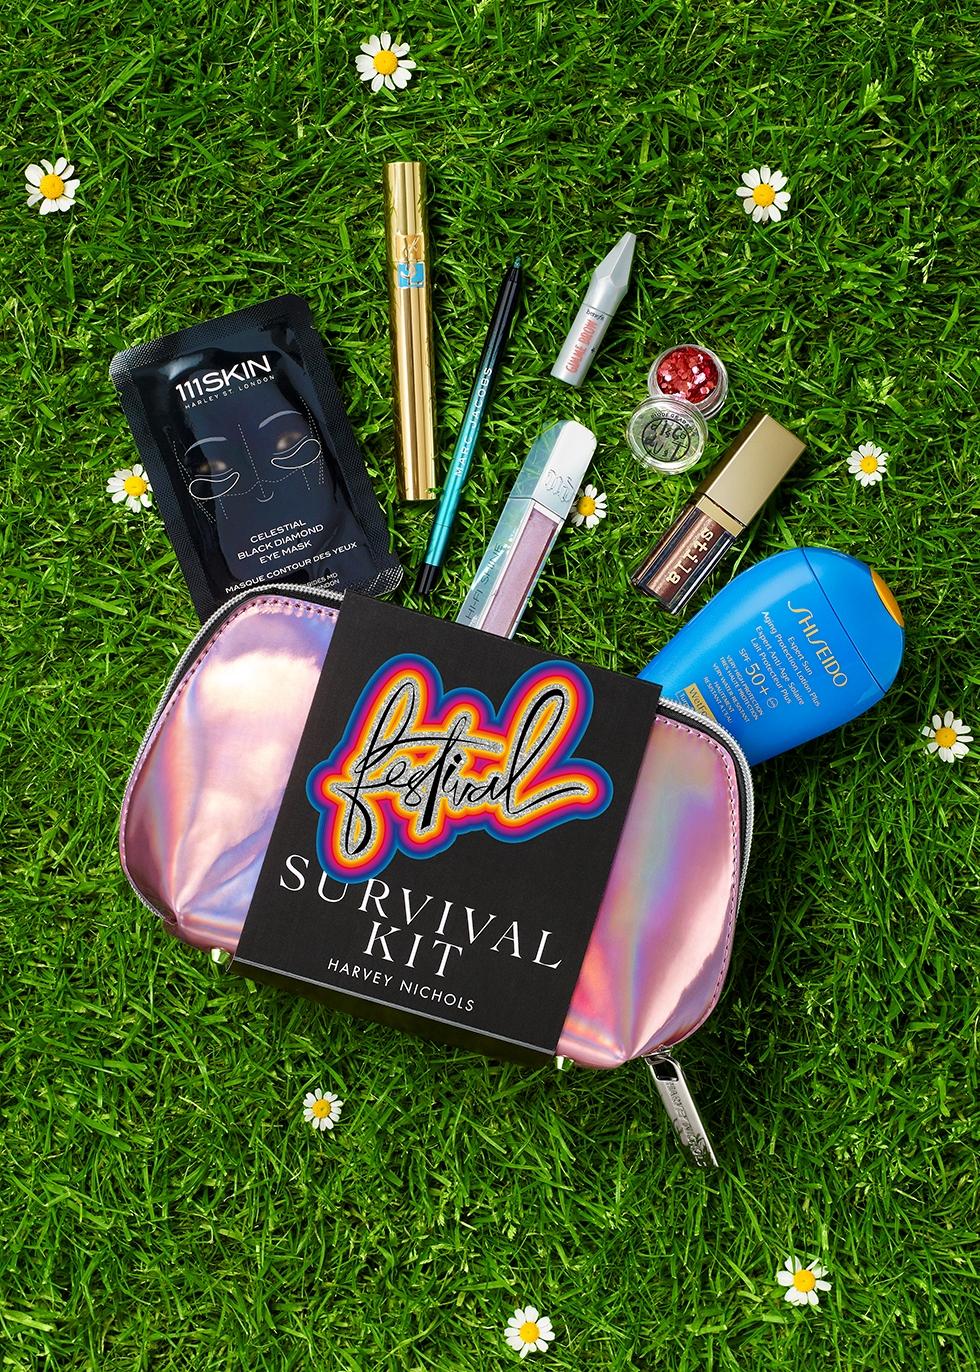 Festival Survival Kit - Harvey Nichols